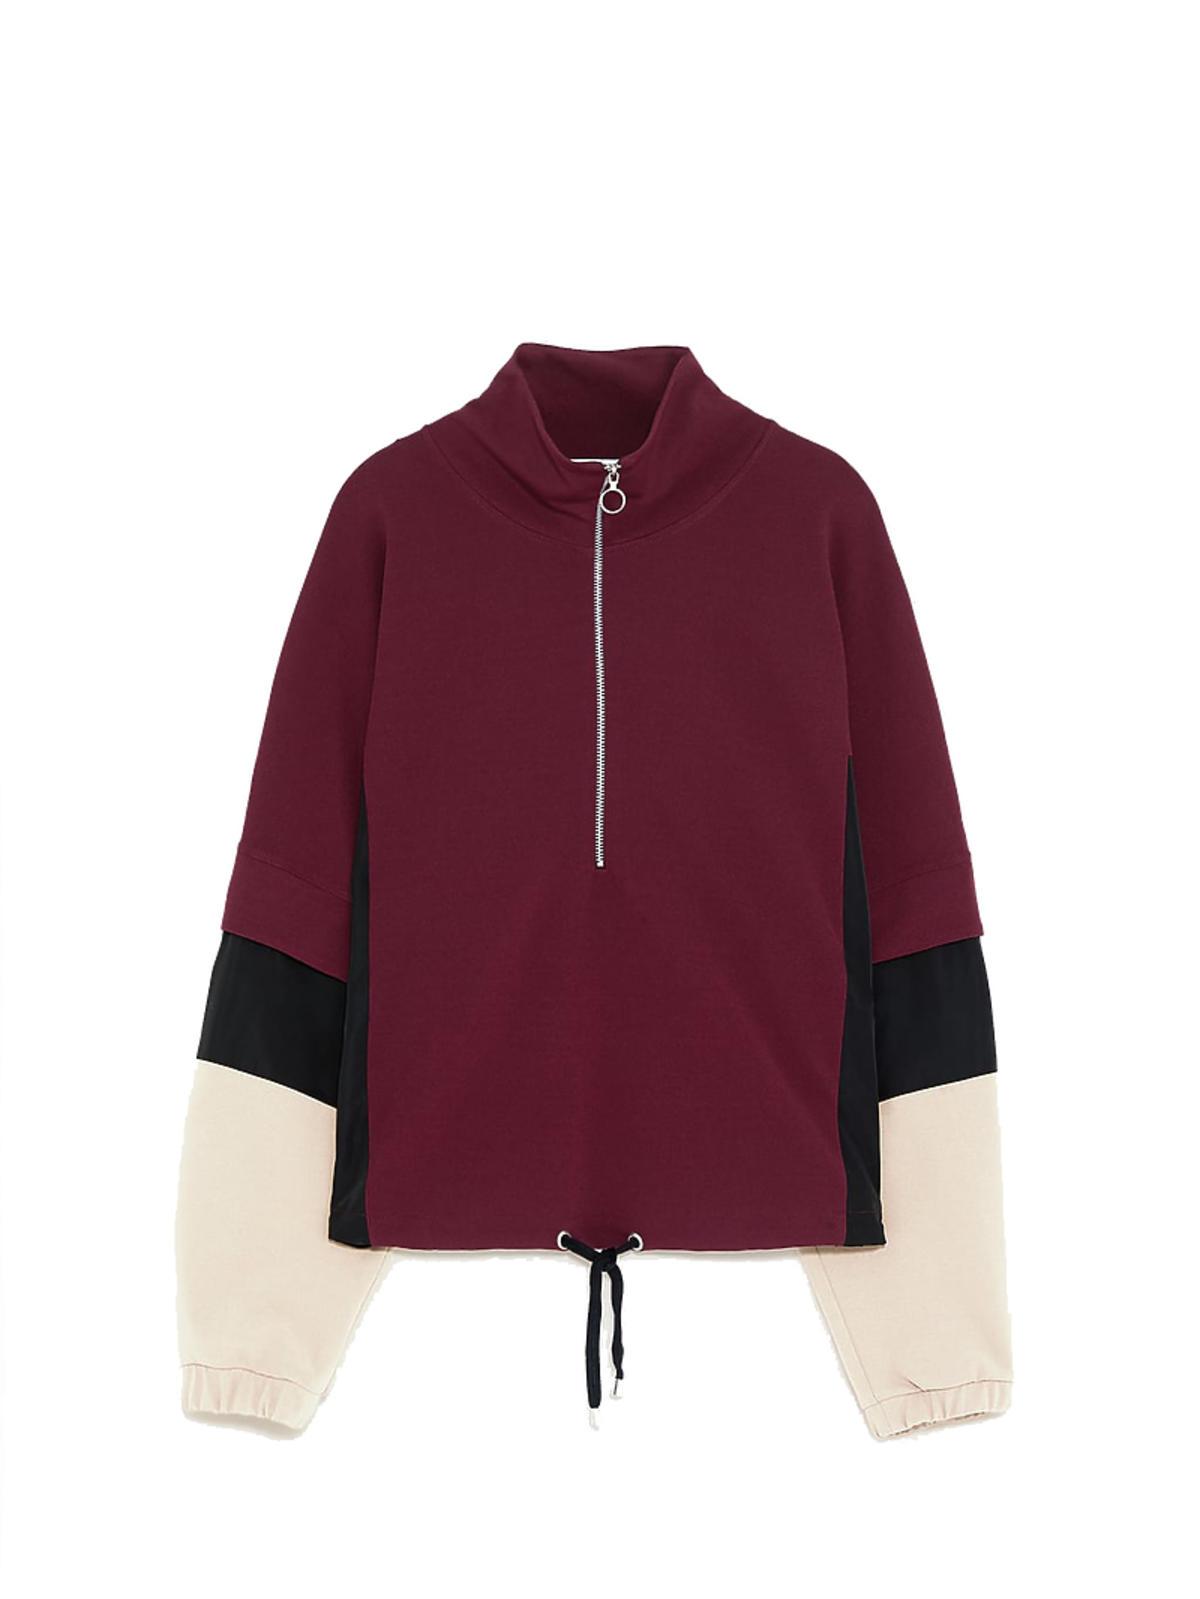 Zara, aktualna cena 99,90 zł